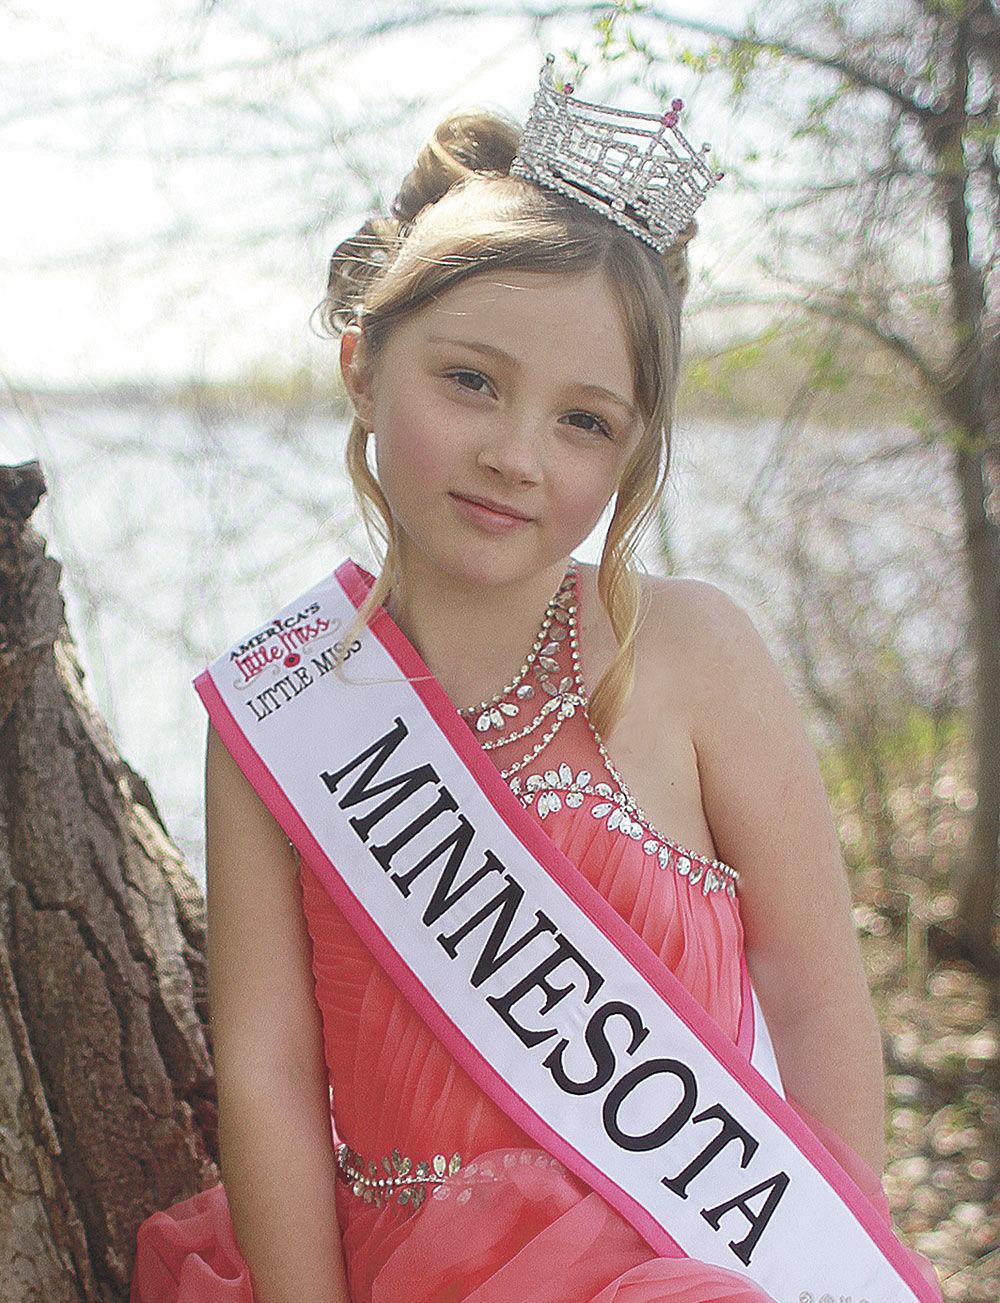 Dreaming big: Little Miss Forest Lake wins Little Miss Minnesota